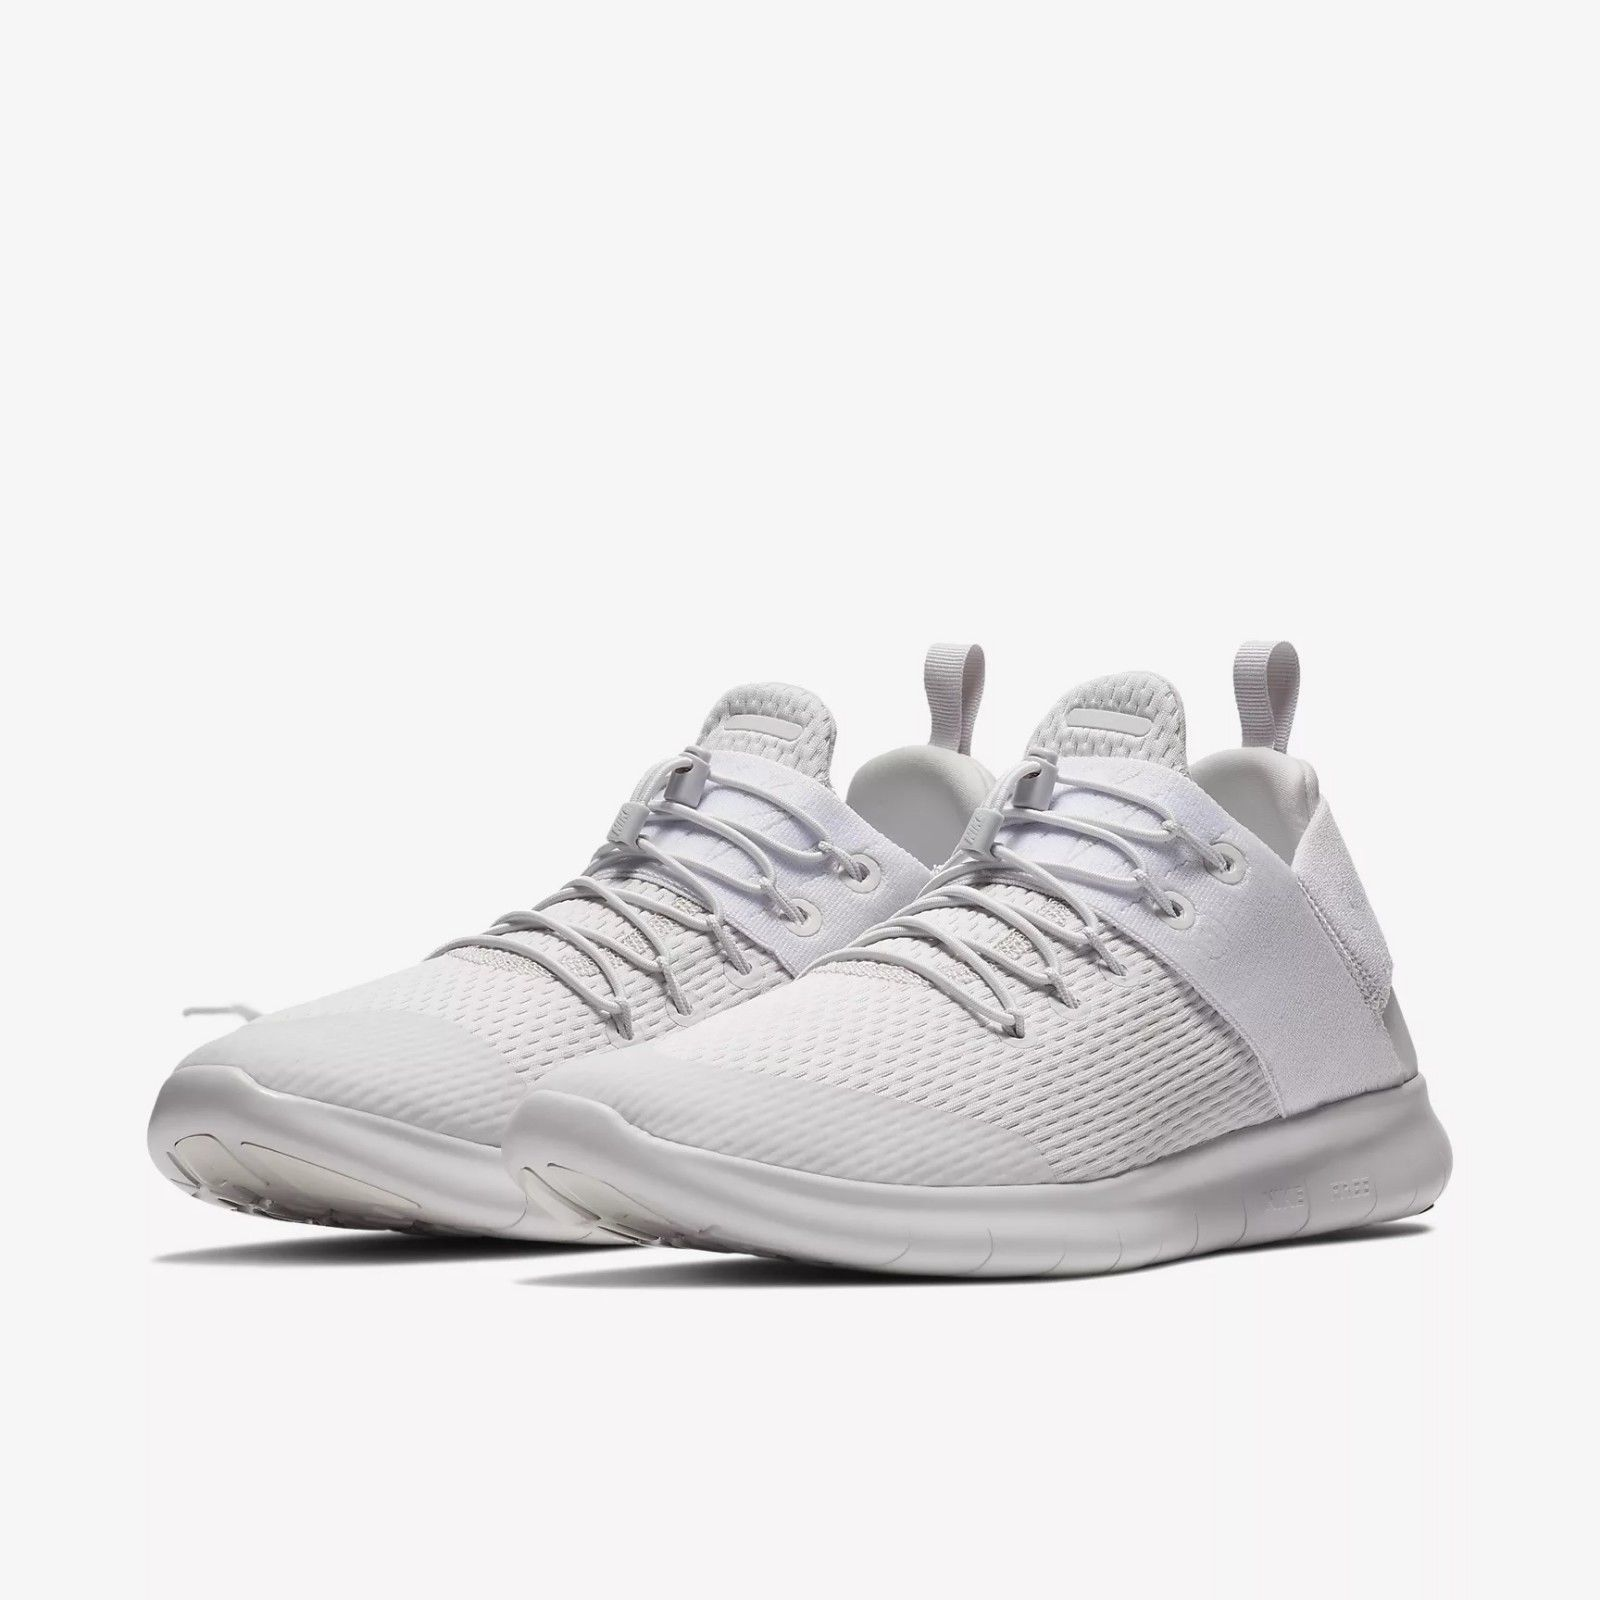 975deaa4fd9a Men s Nike Free RN Commuter 2017 Running and 49 similar items